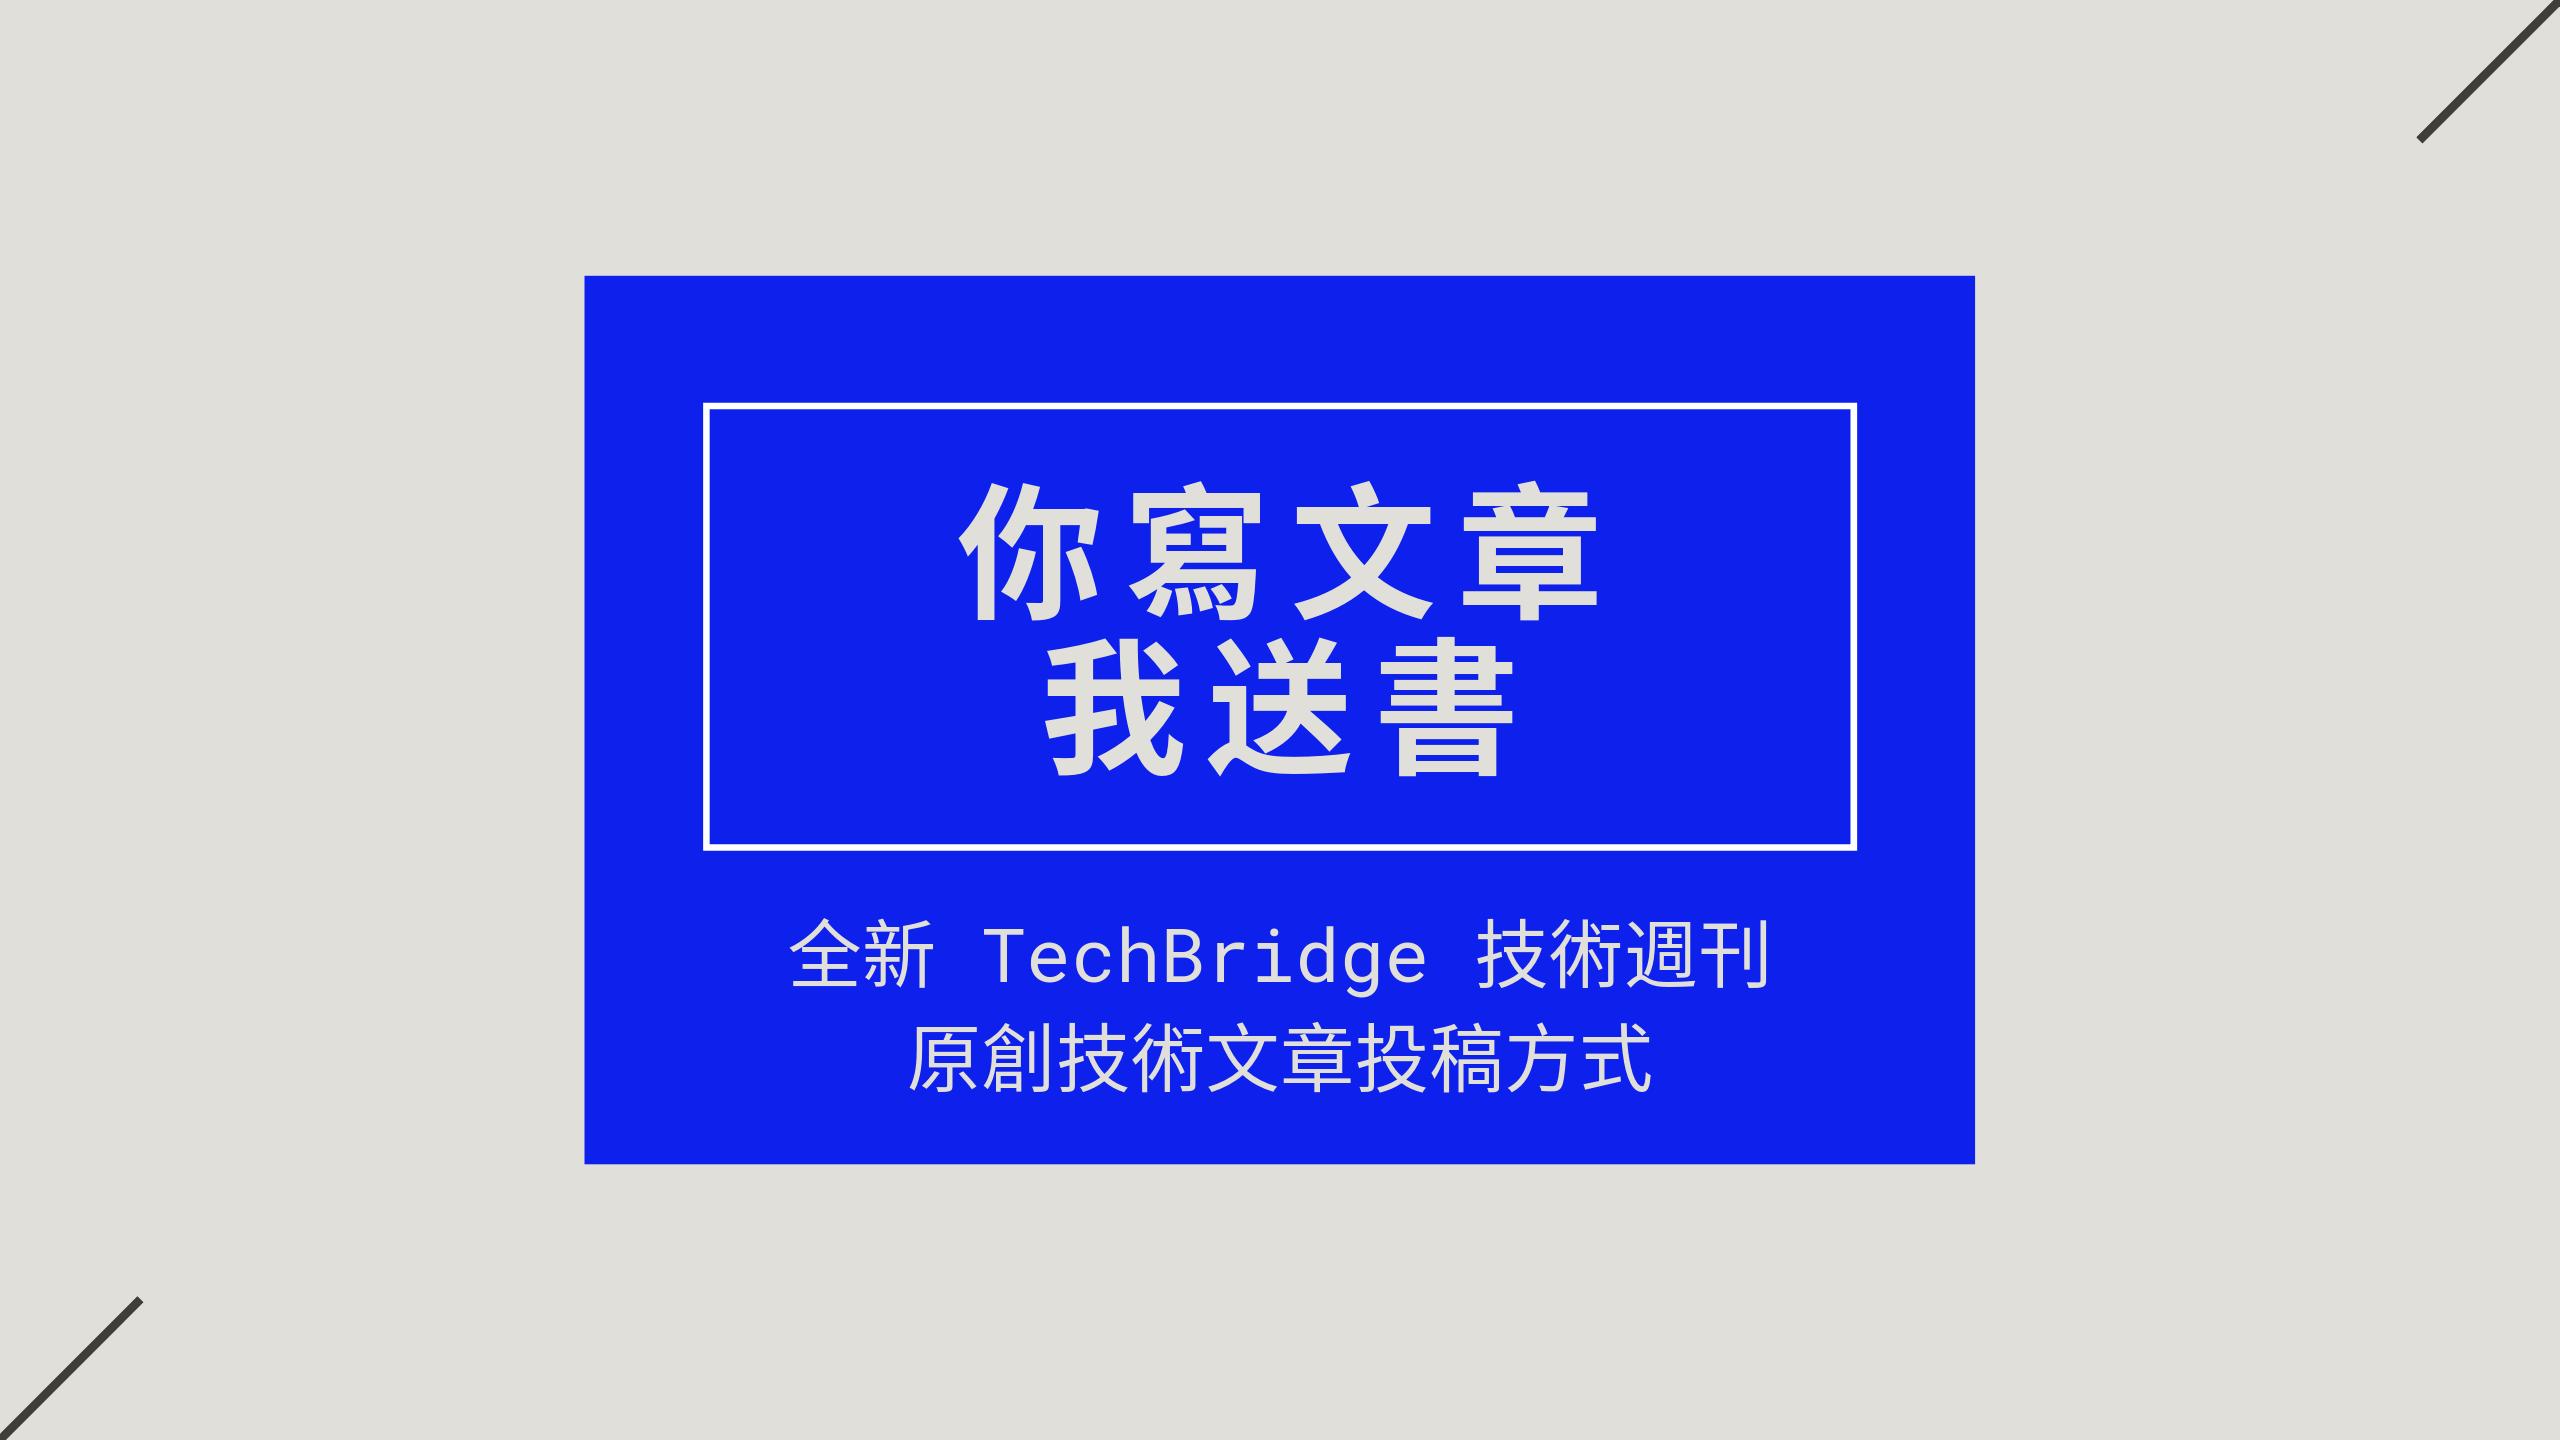 https://static.coderbridge.com/img/TechBridgeWeekly/30d14d91fb1645138f17a709f319036b